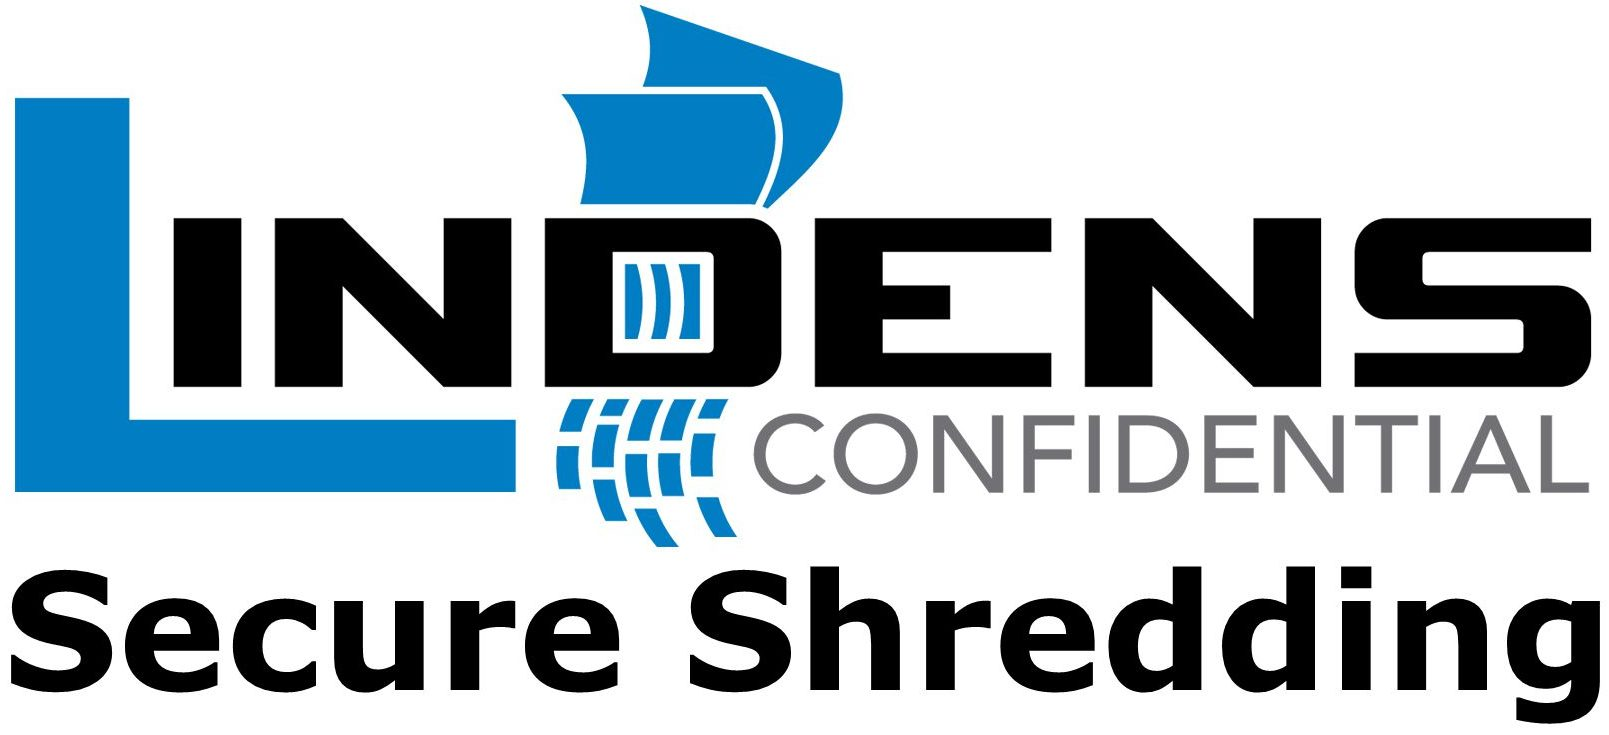 Lindens Confidential Milton Keynes